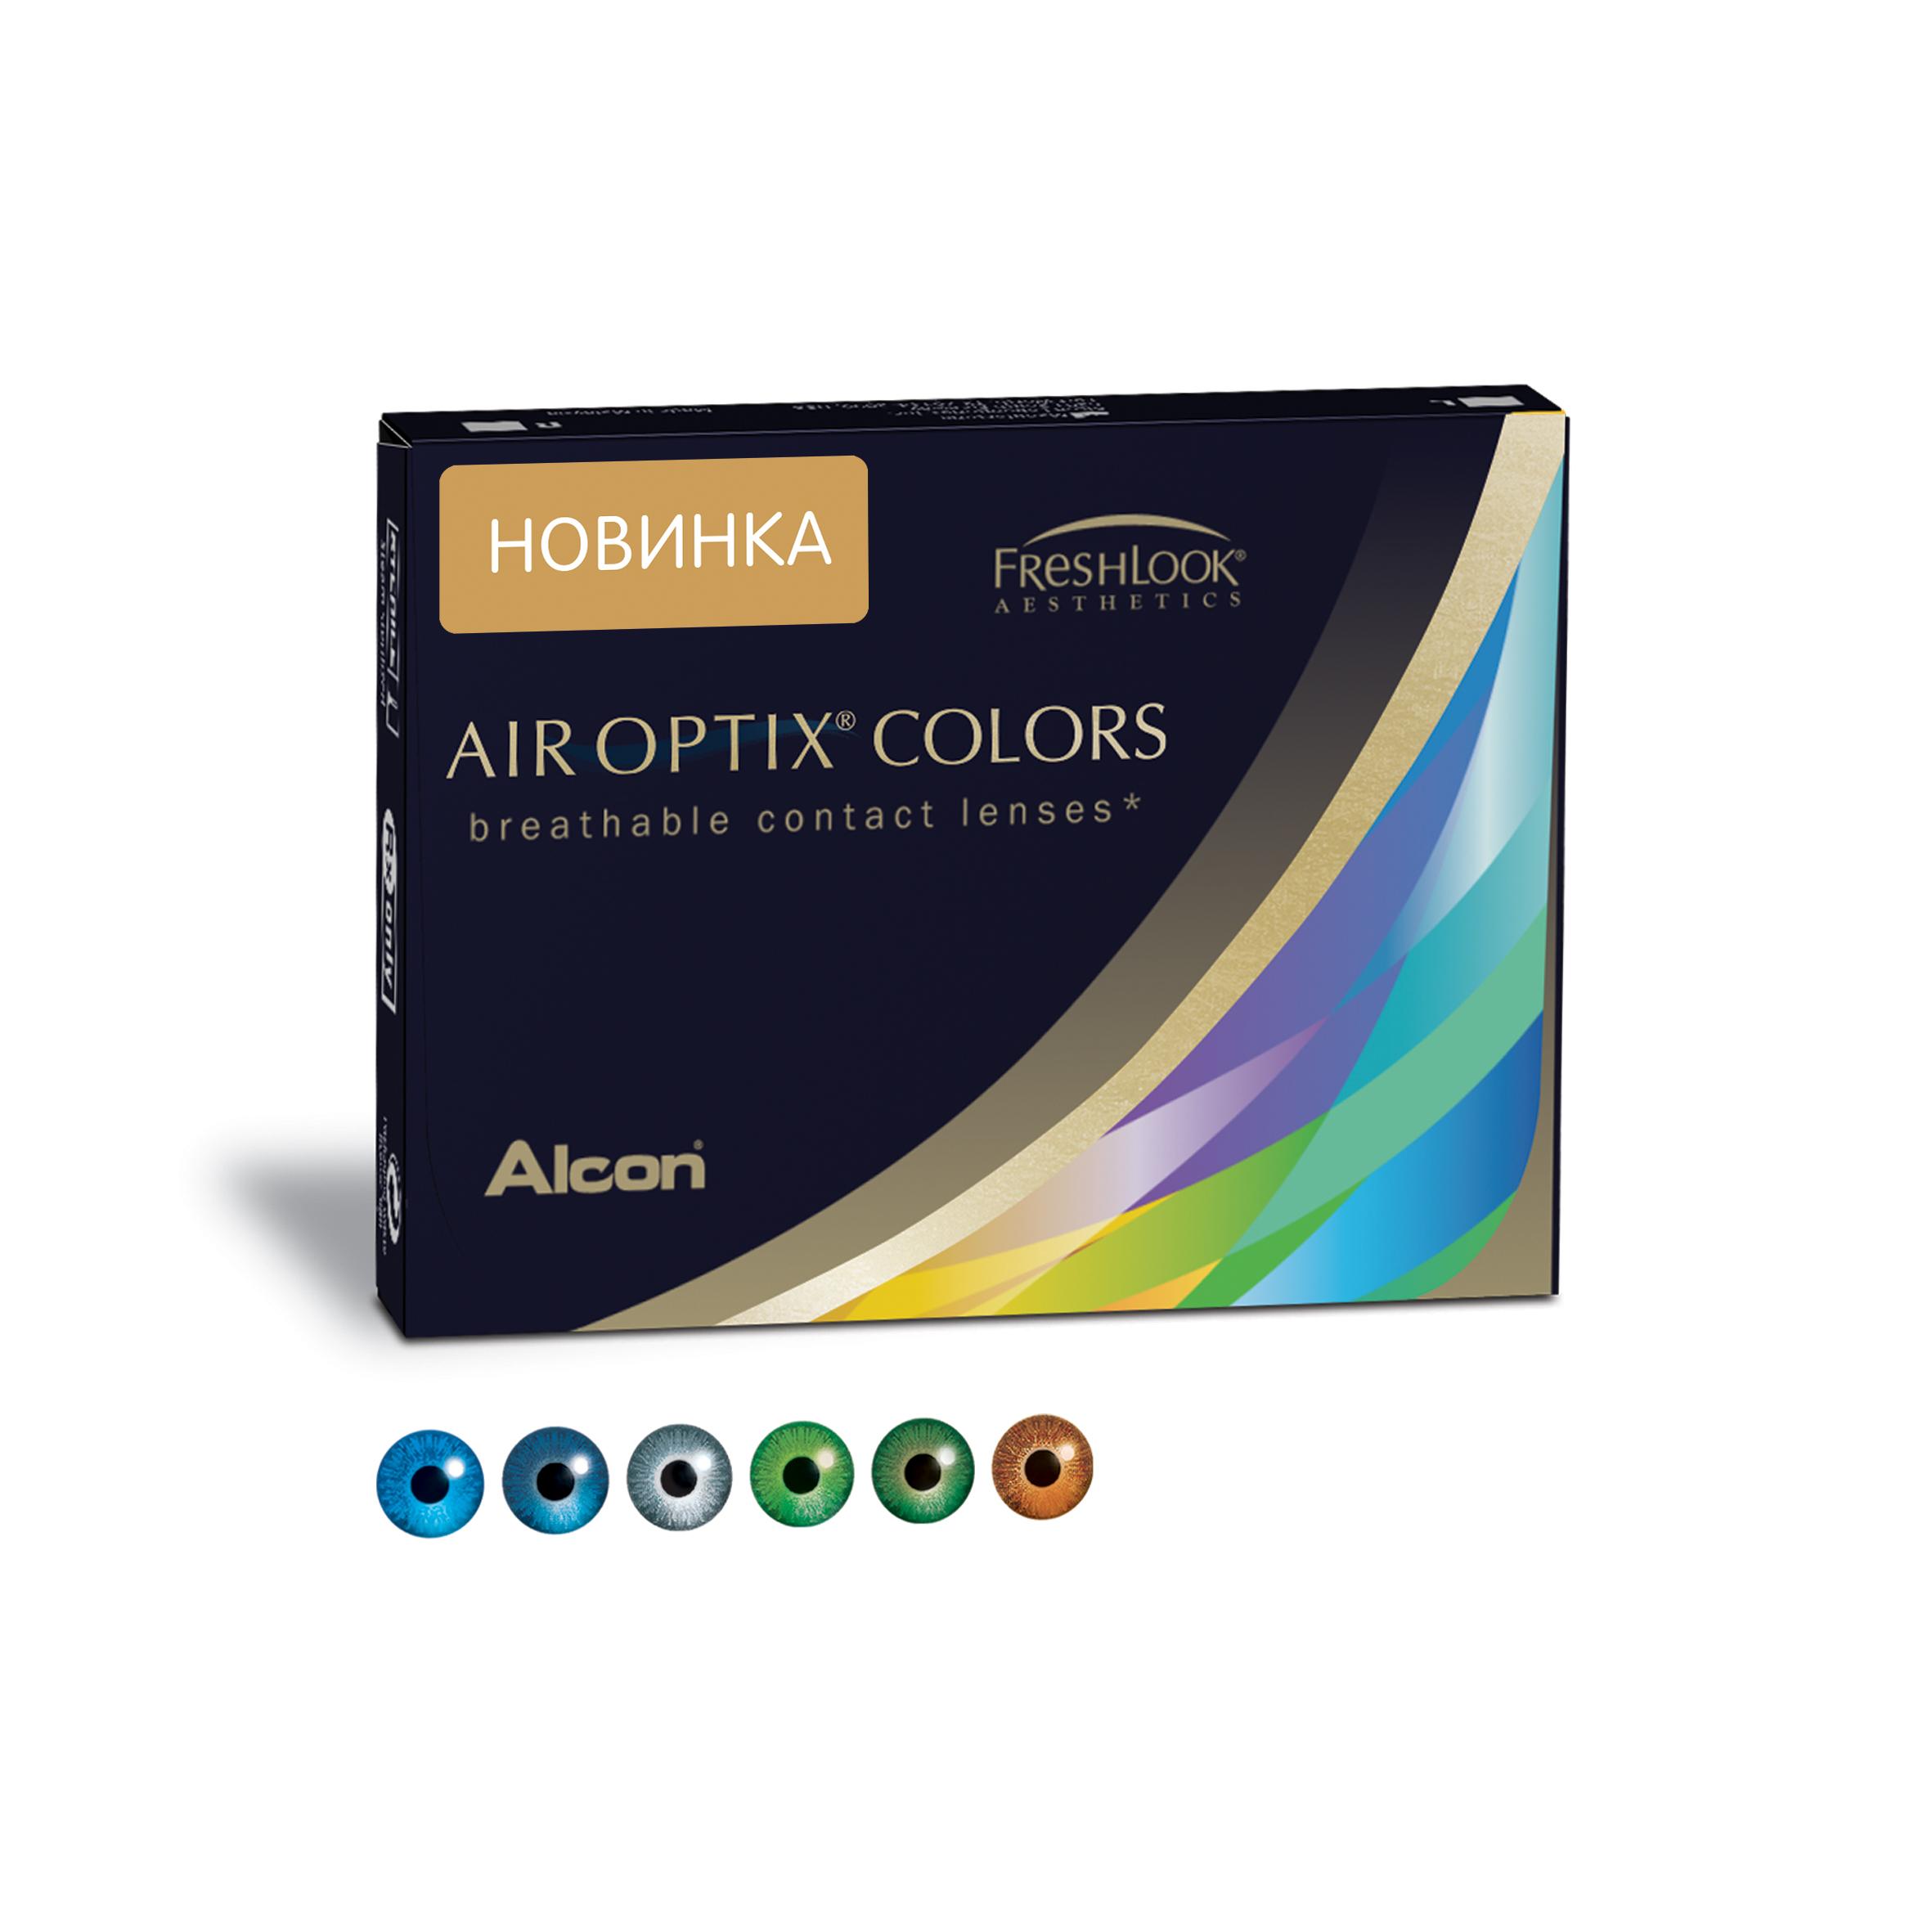 Аlcon контактные линзы Air Optix Colors 2 шт -2.50 Sterling Gray31746183Мягкие контактные линзы